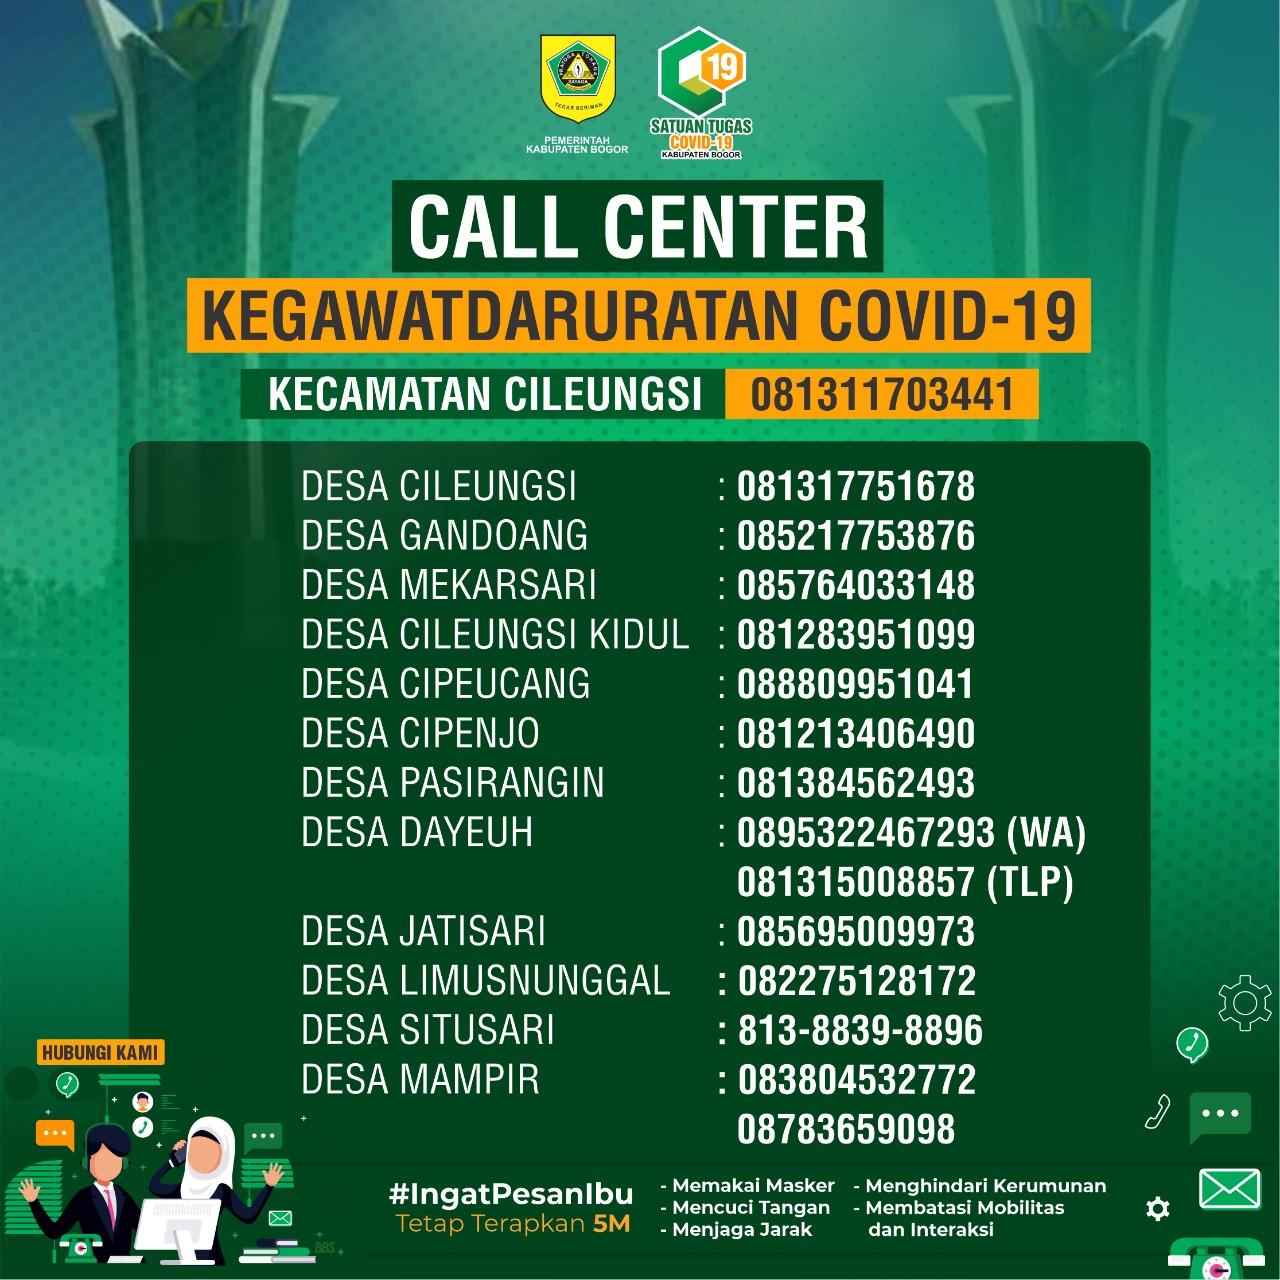 Calll Center Covid-19 Kecamatan Cileungsi